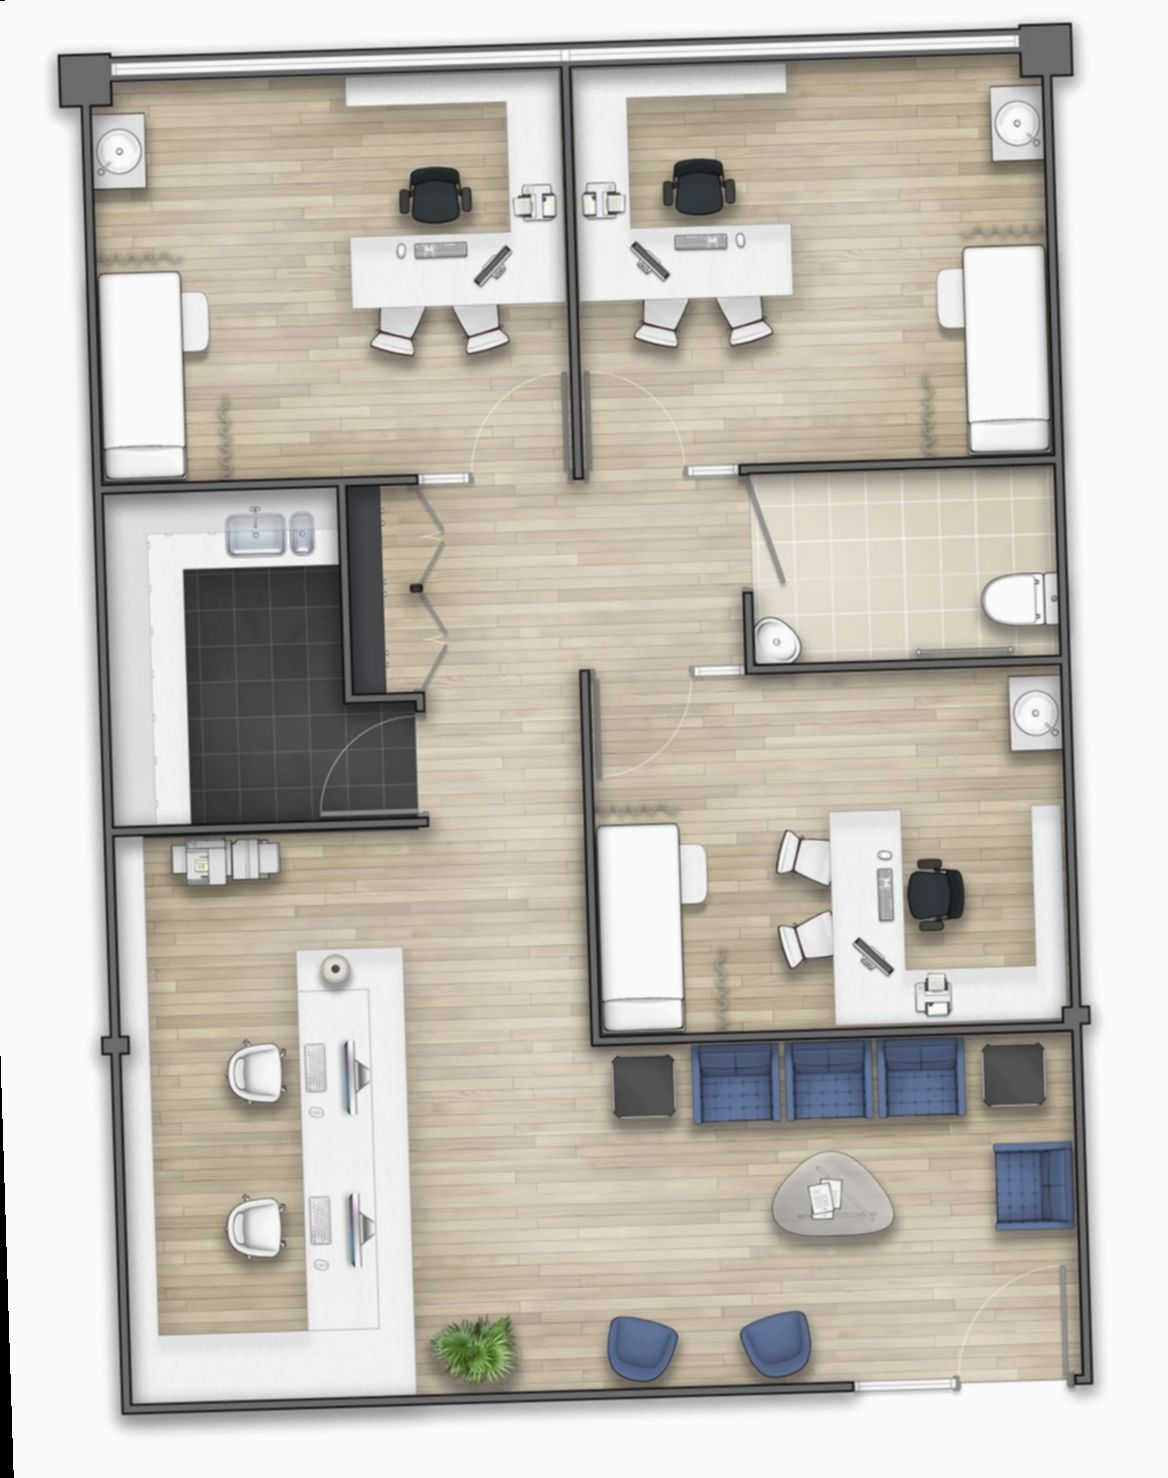 Office Design Layout Floor Plans Minimalistic Officeinspo Setup In 2020 Small Office Design Modern Office Design Office Layout